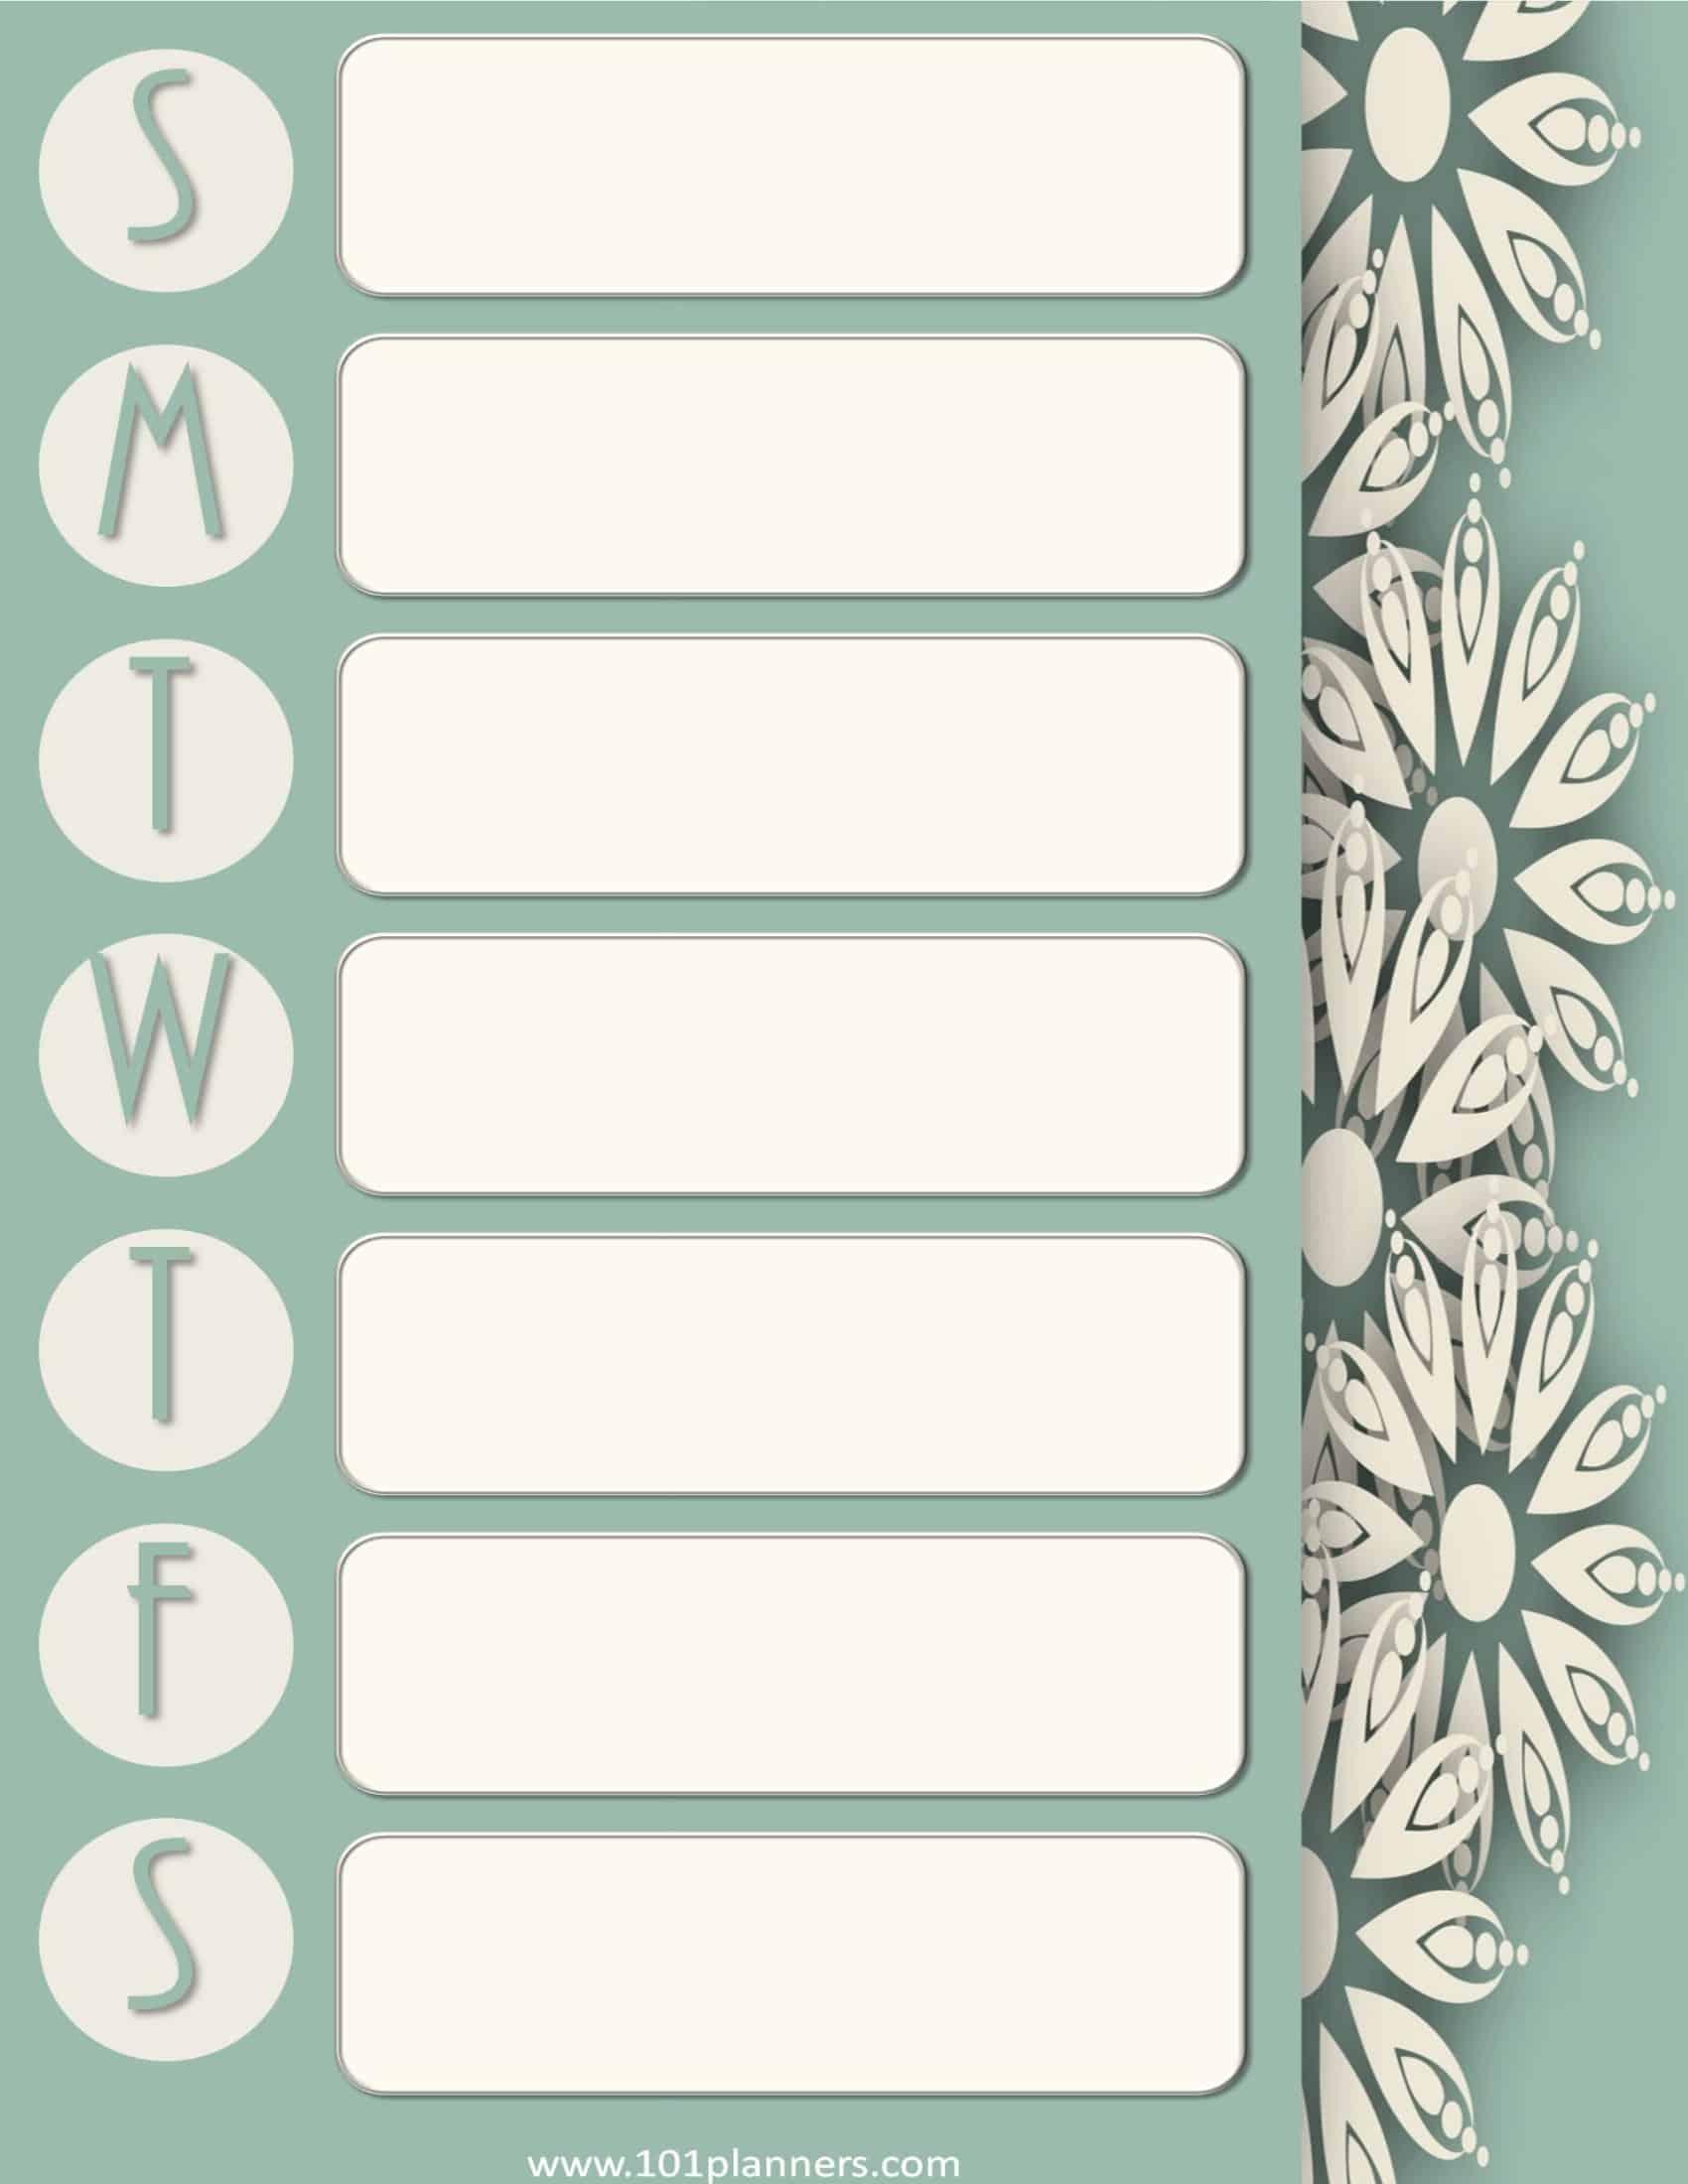 Design Your Own Home Layout Weekly Calendar Maker Create Free Custom Calendars